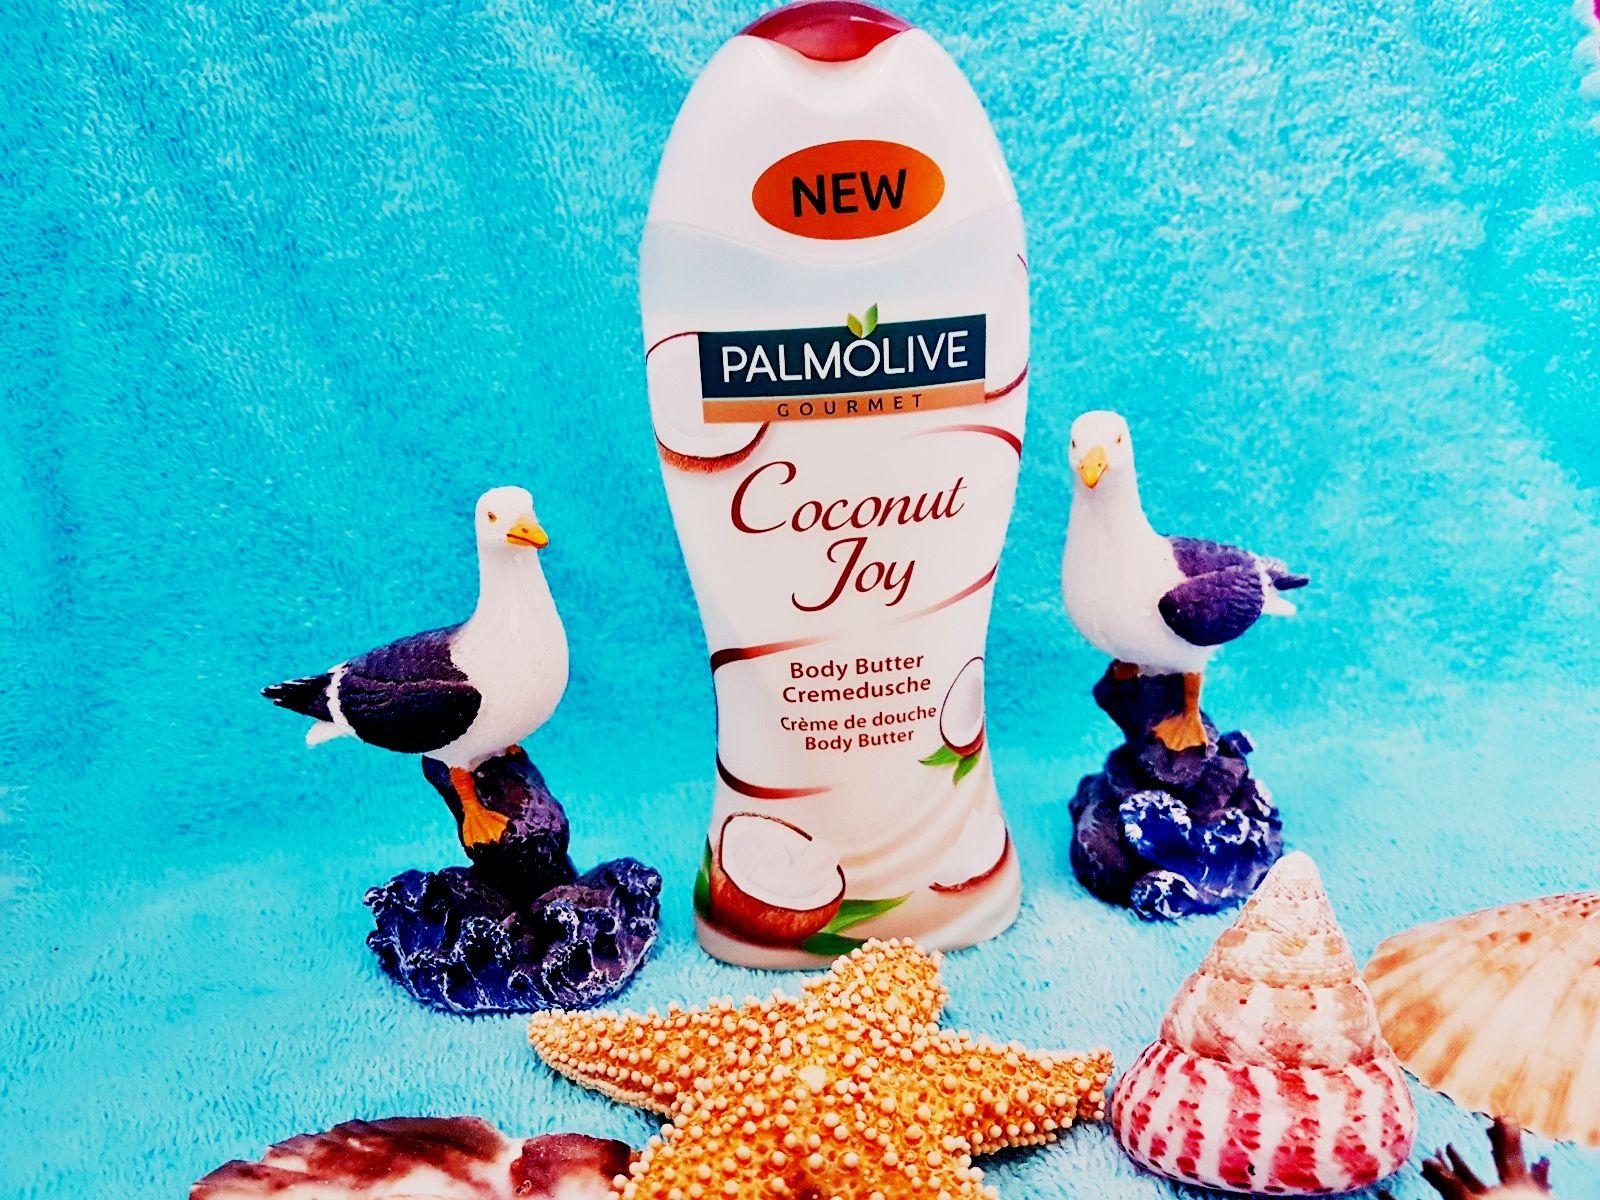 Palmolive Gourmet Coconut Joy Body Butter Cremedusche